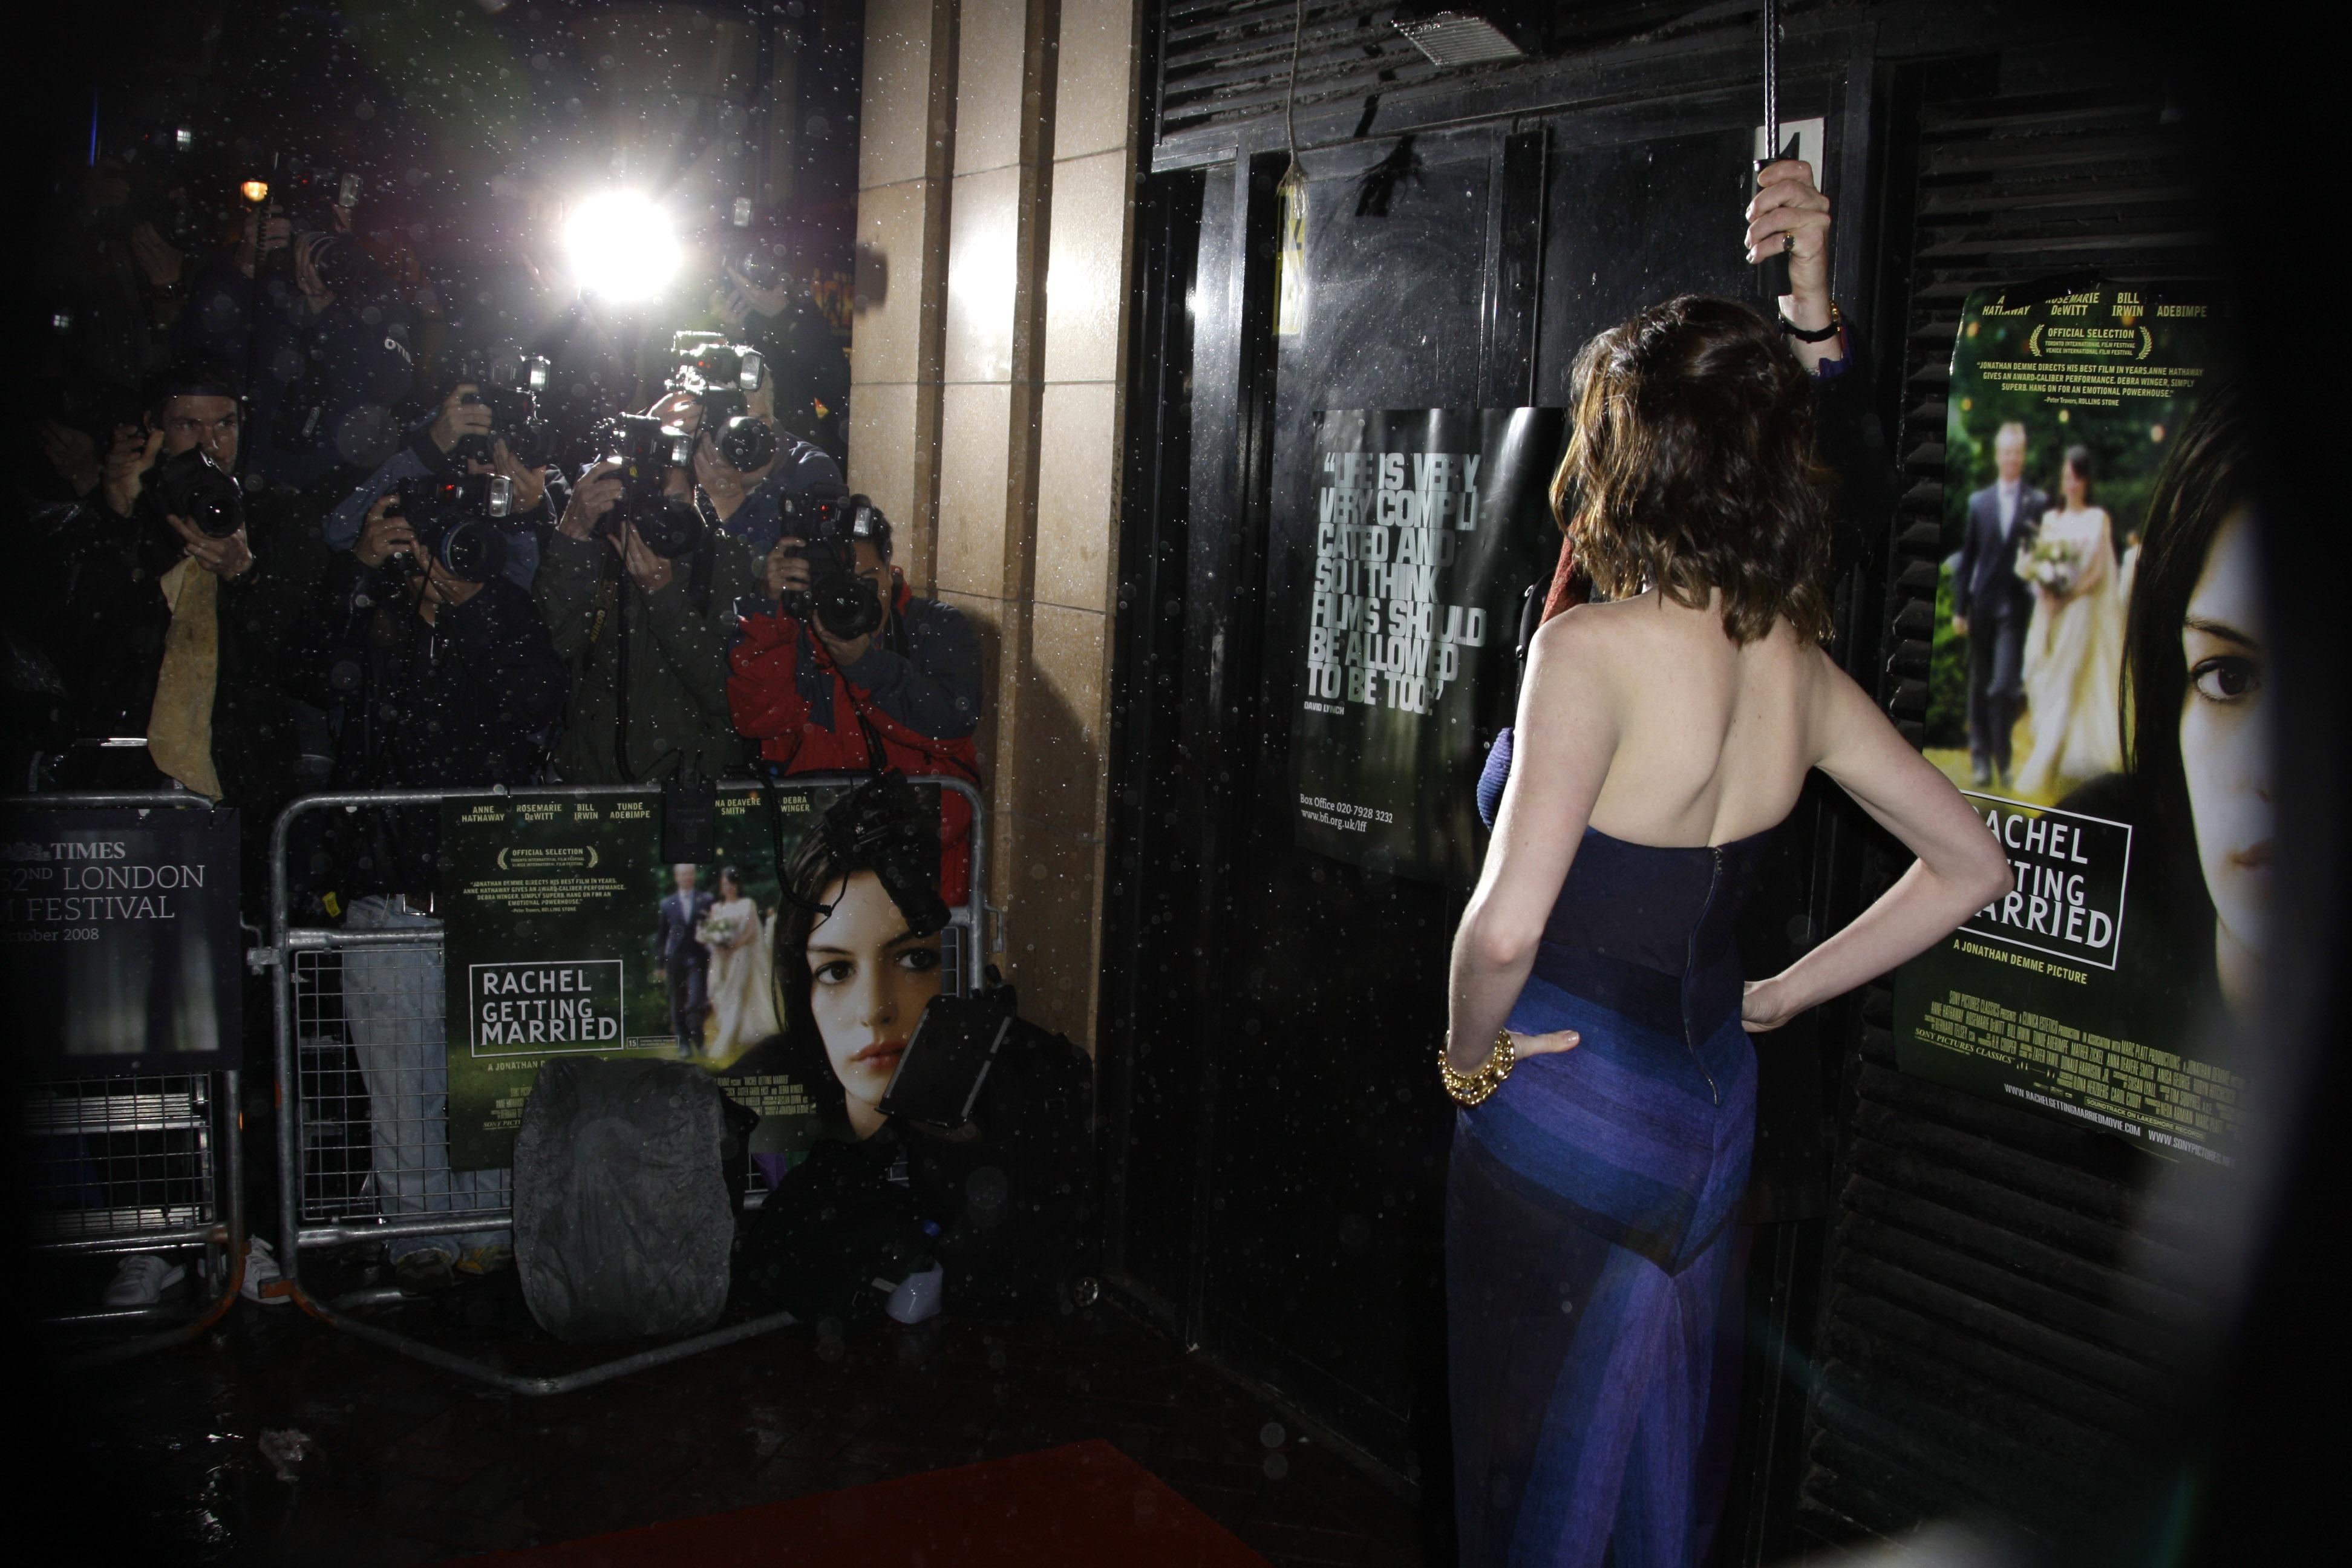 36782_Anne_Hathaway-Rachel_Getting_Married_premiere-030_122_852lo.jpg